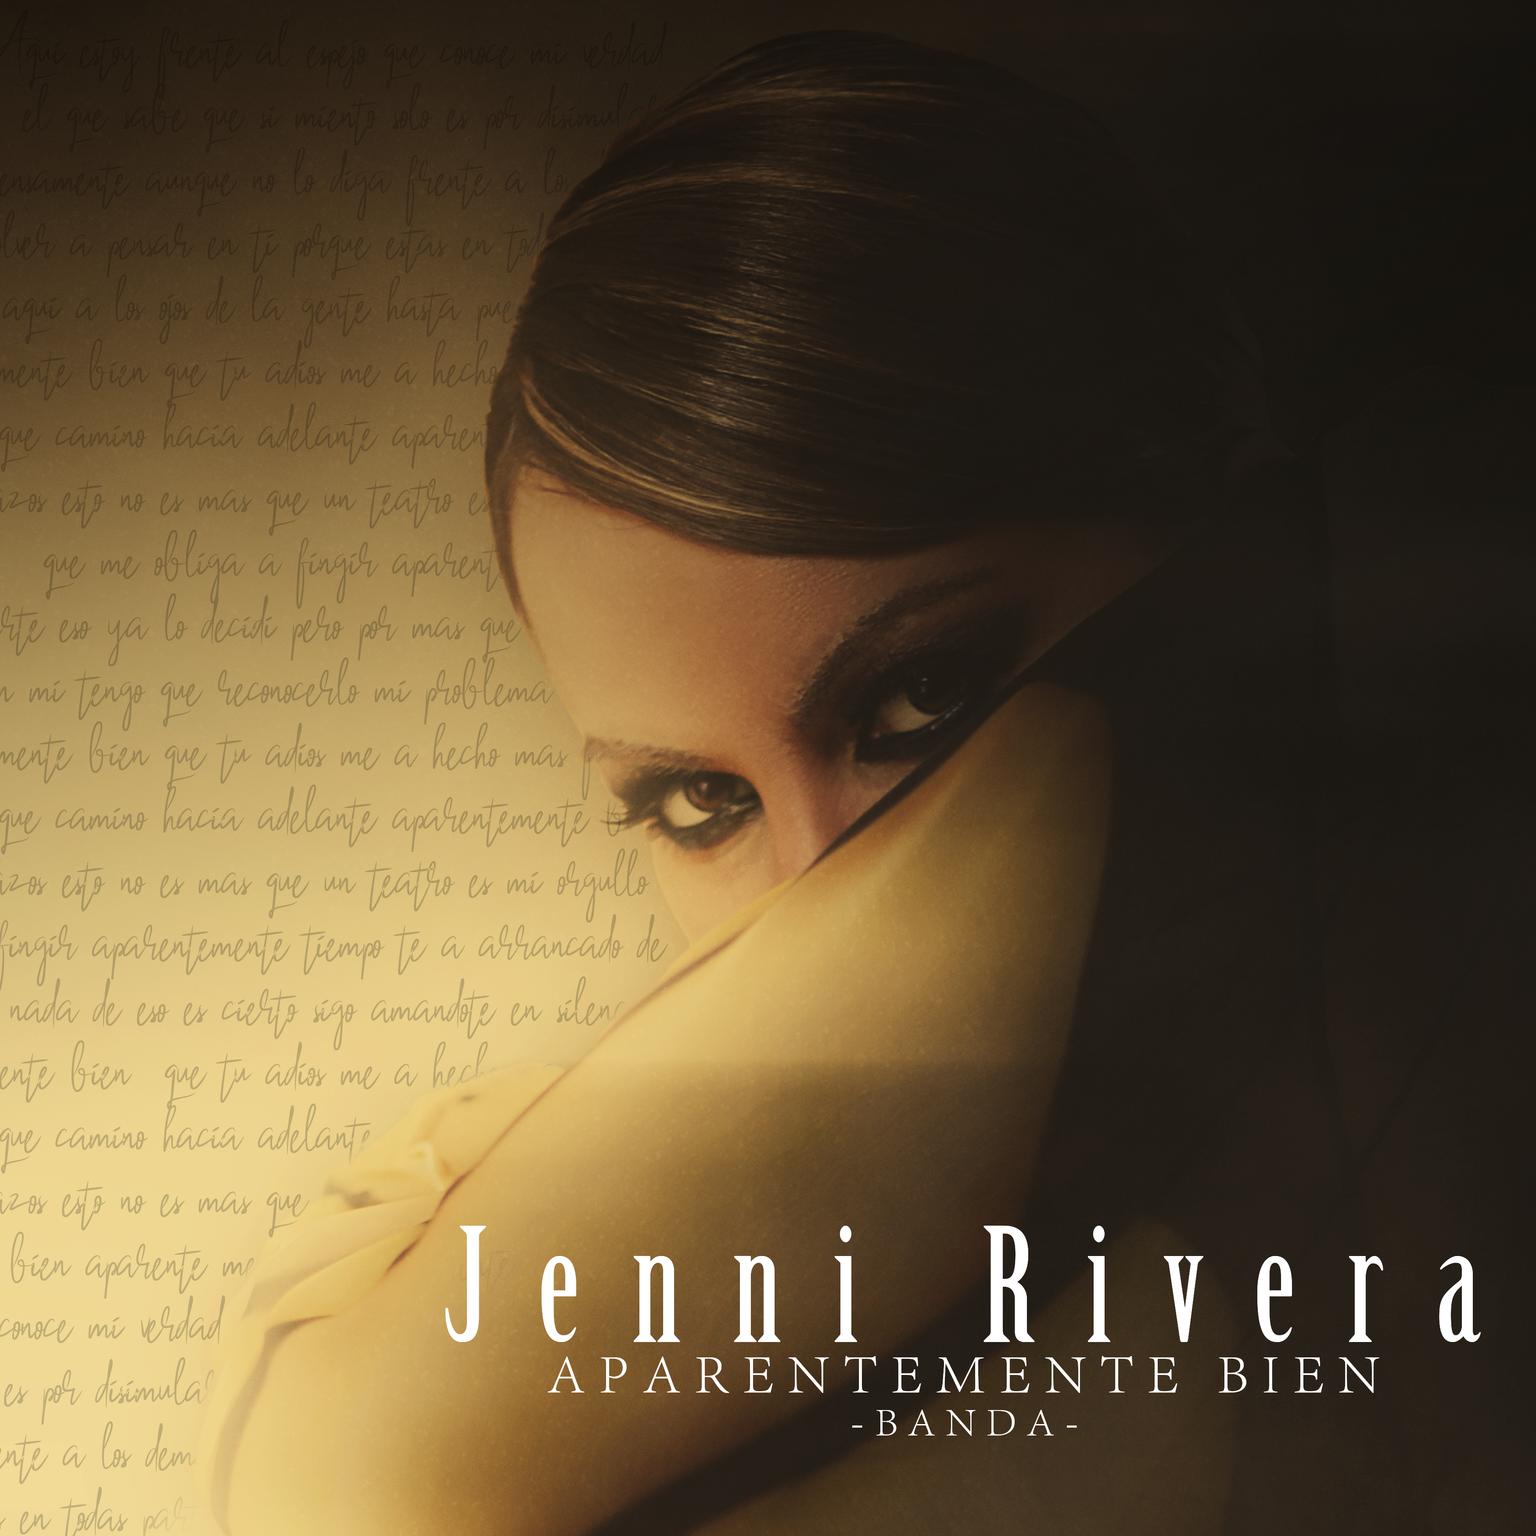 JenniRivera_AparentementeBien_Cover